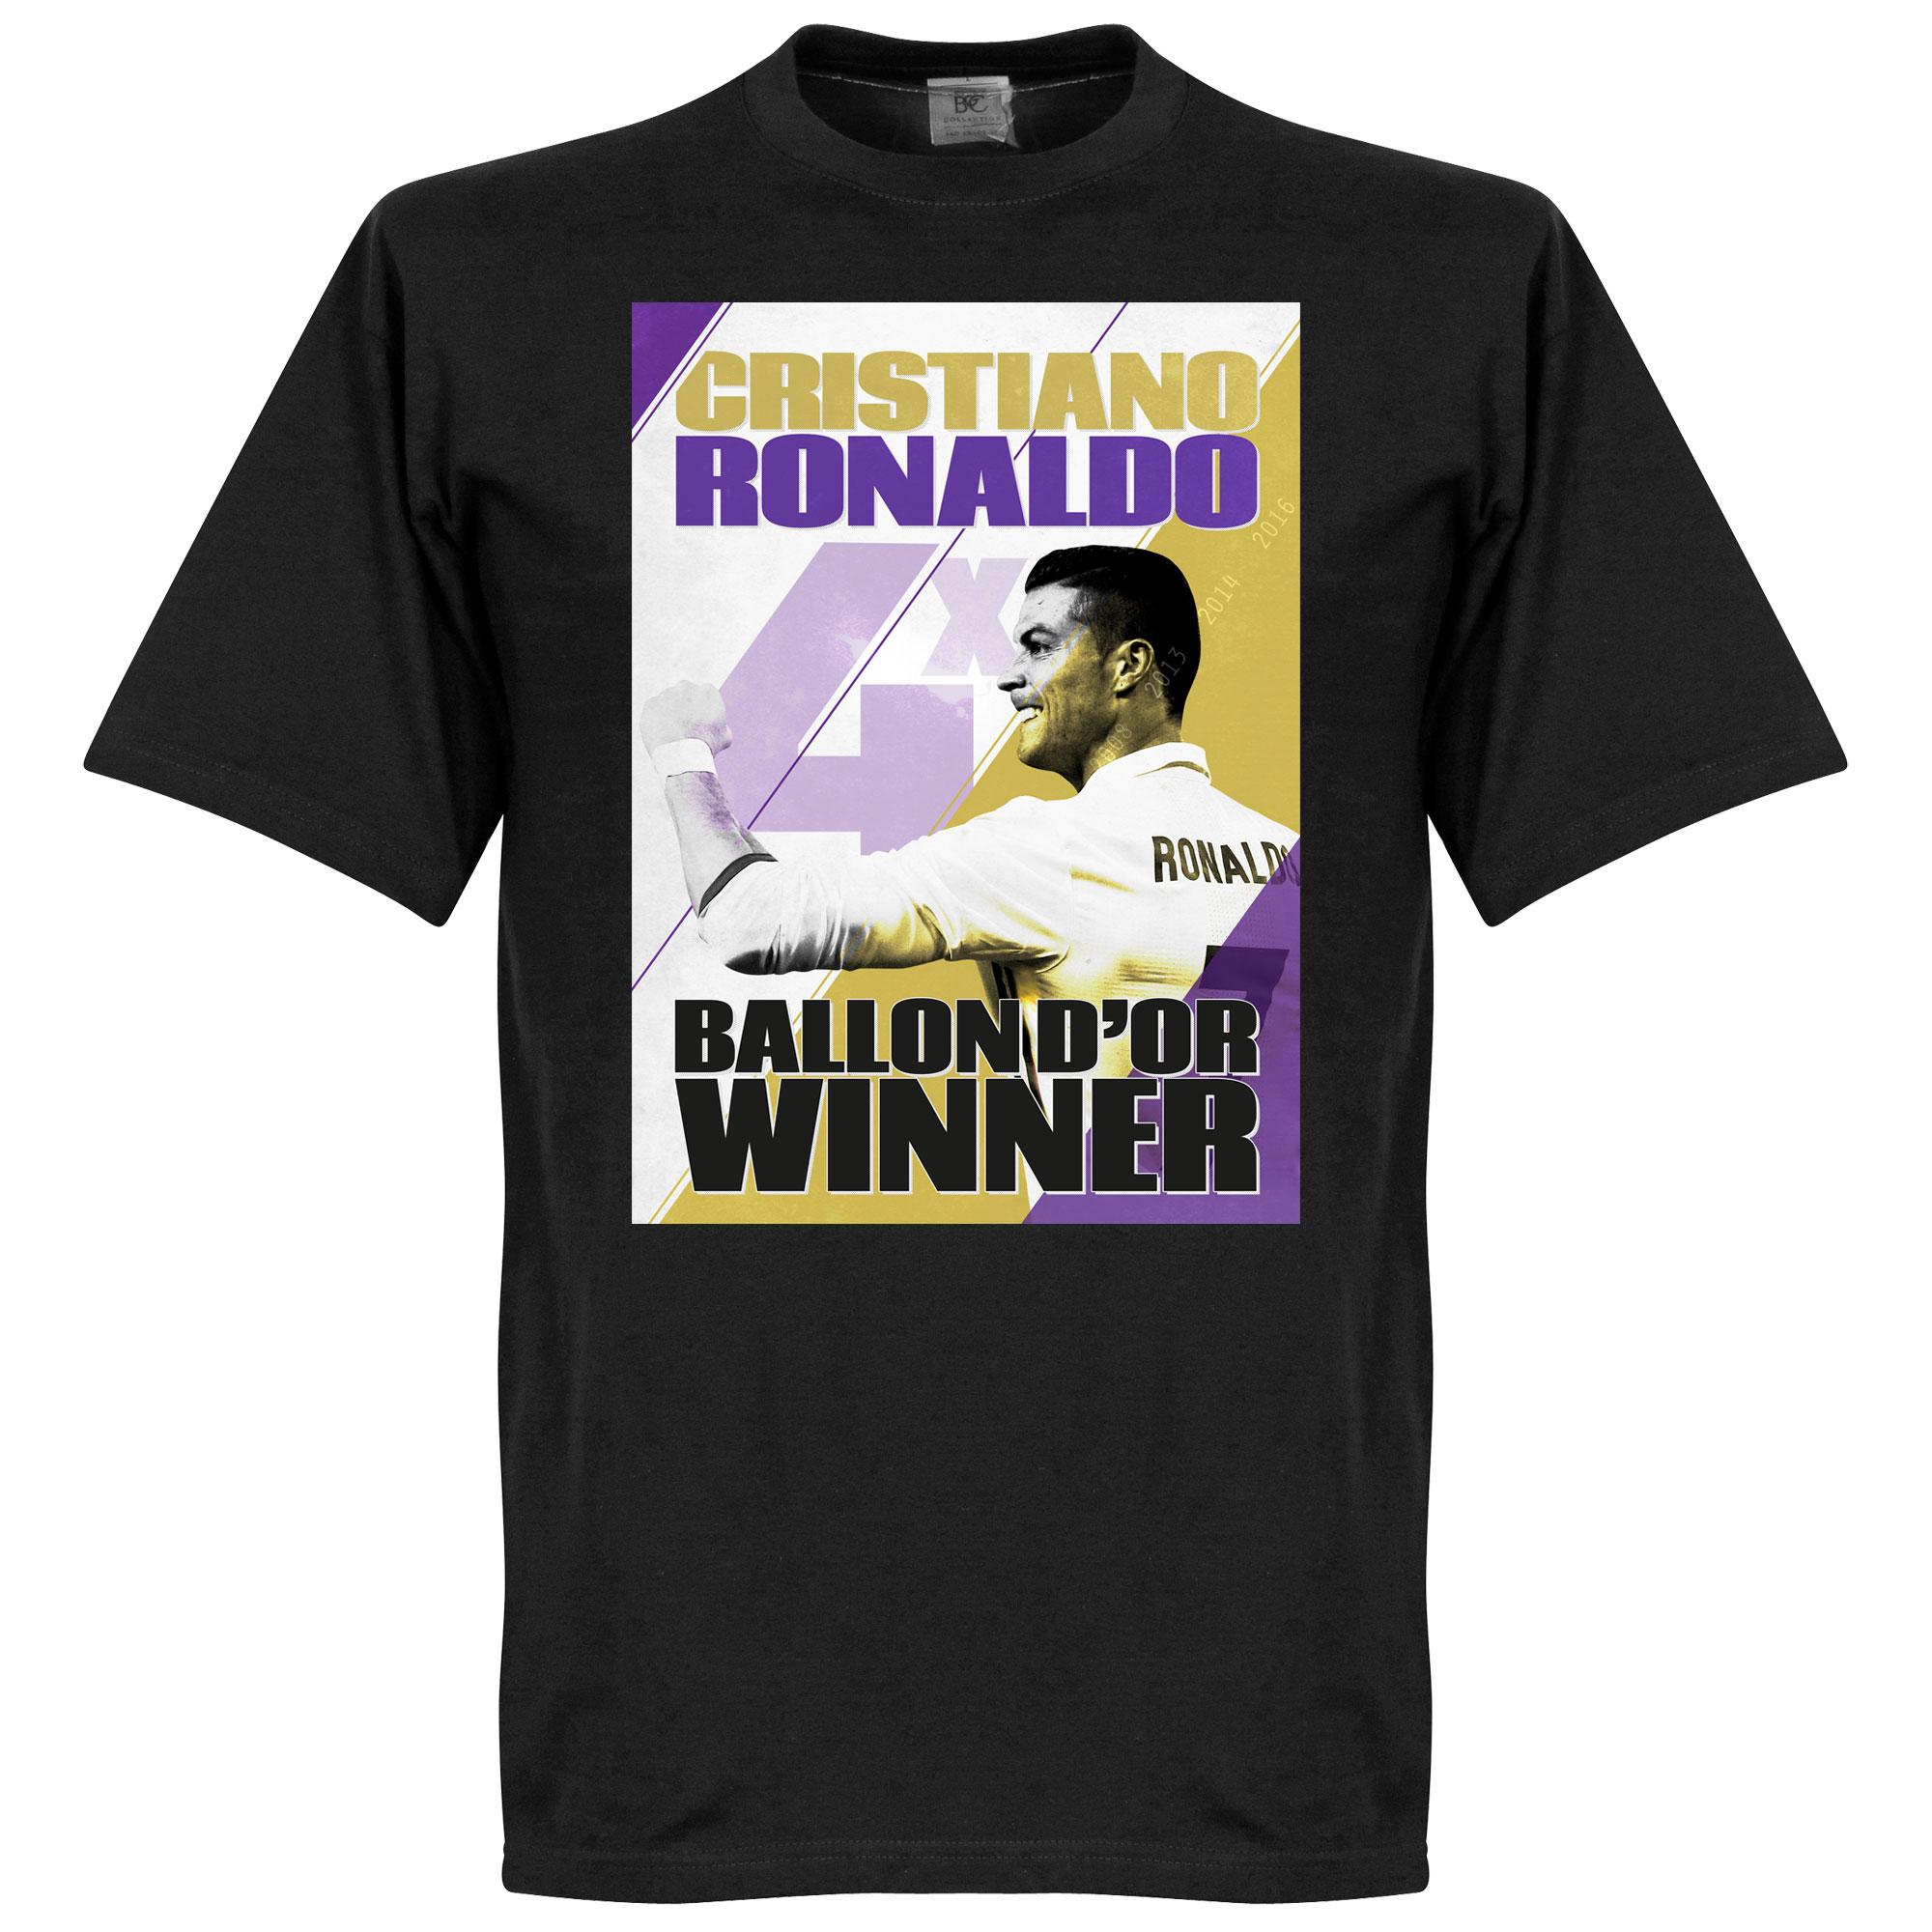 Ronaldo 4 Times Ballon d'Or Winners Madrid Tee - Black - XS